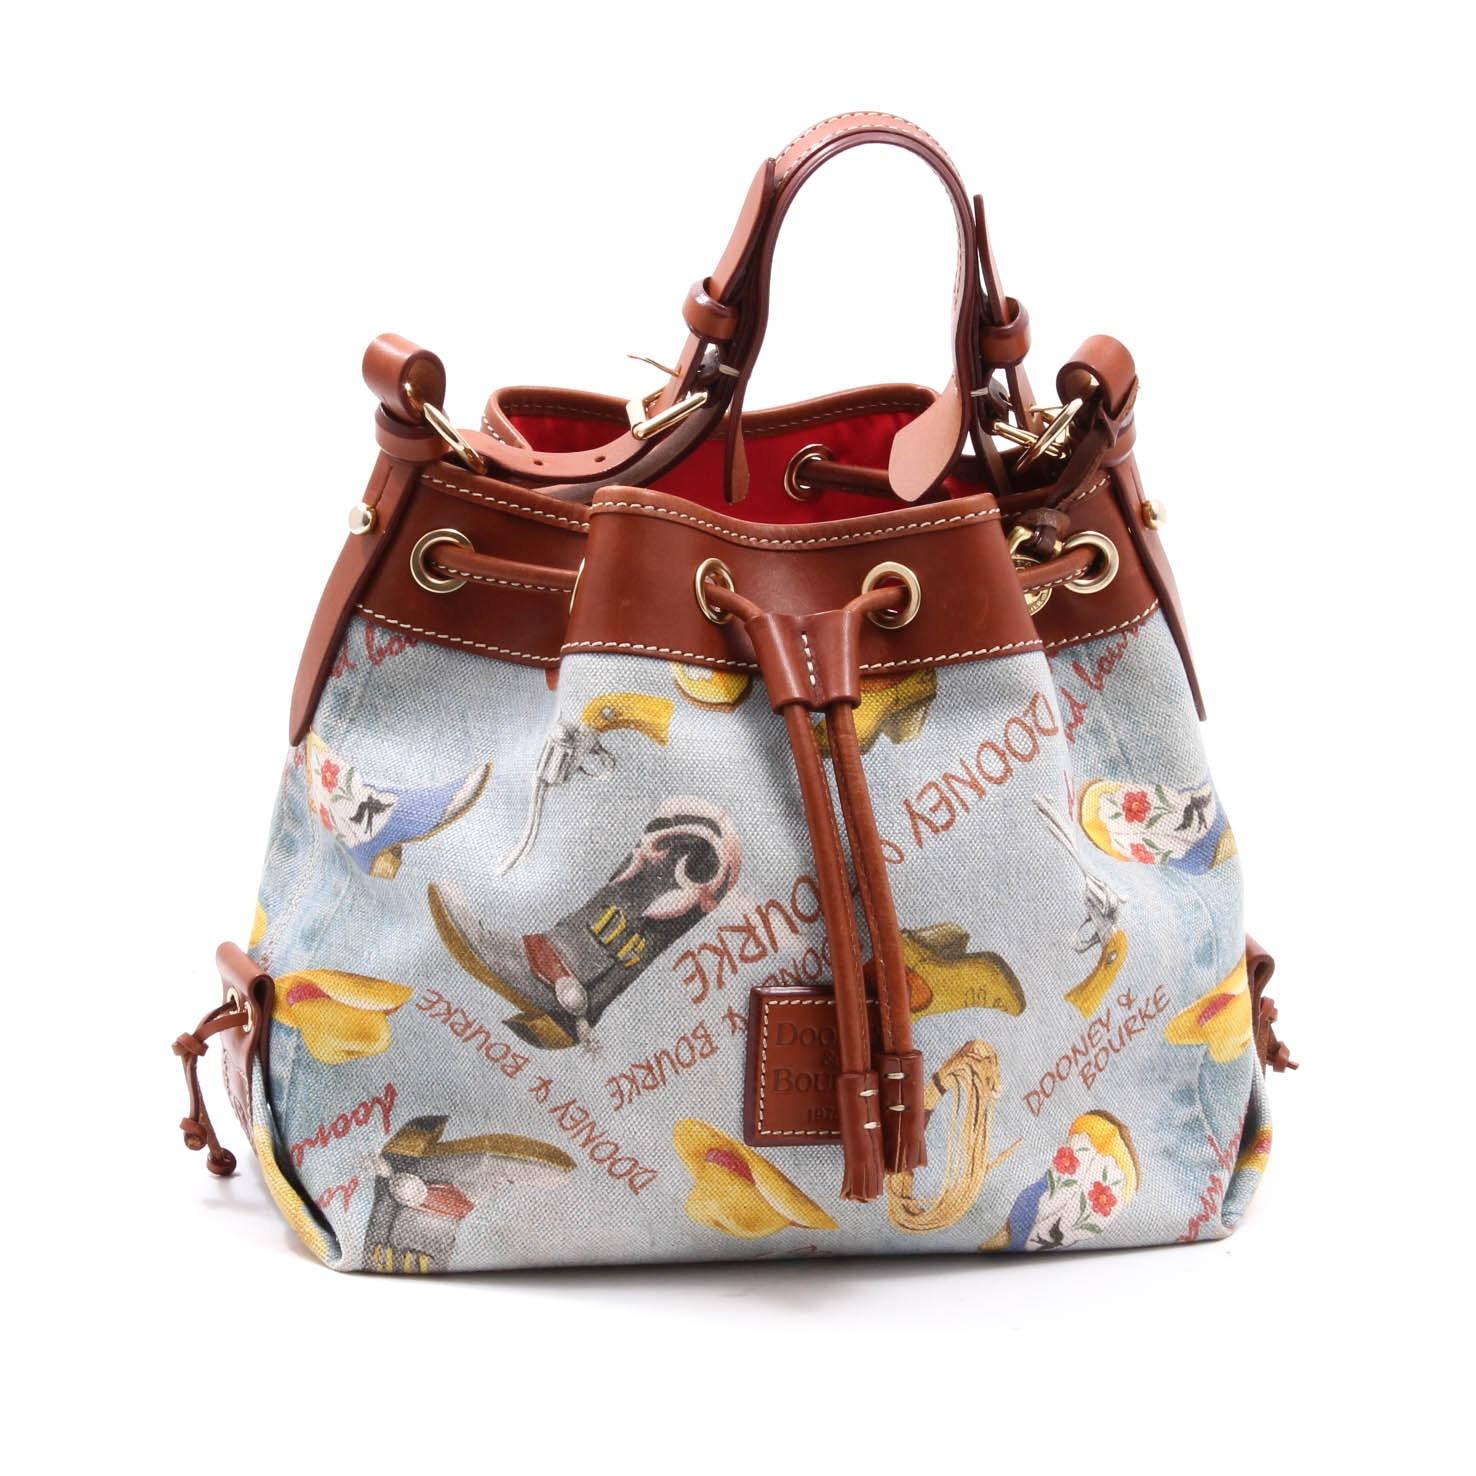 Dooney & Bourke Texas Signature Drawstring Handbag